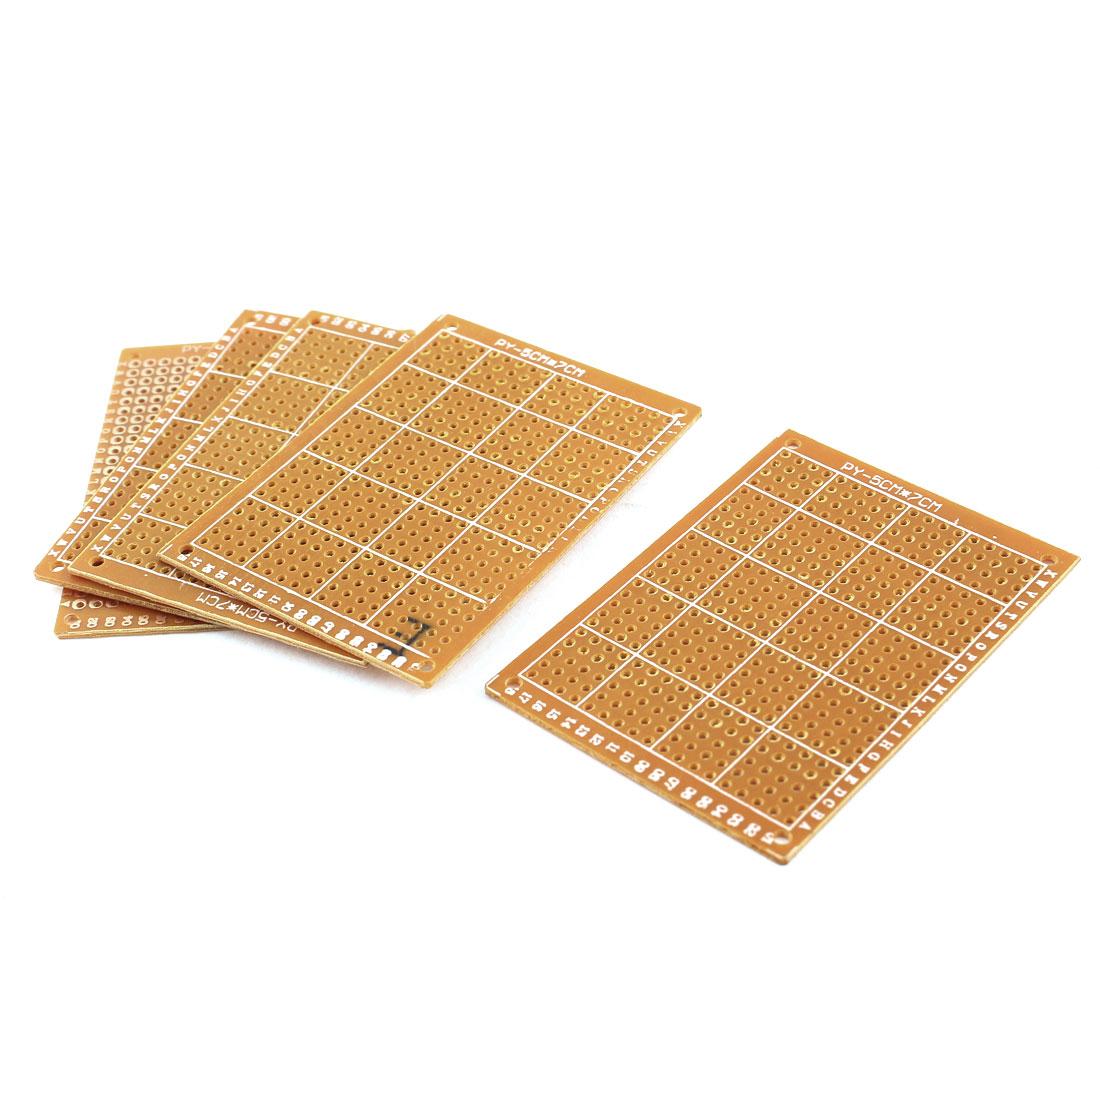 5pcs Universal Prototyping 2.54mm Pitch PCB Board Prototype Circuit Breadboard Stripboard Single Side Copper 50x70mm